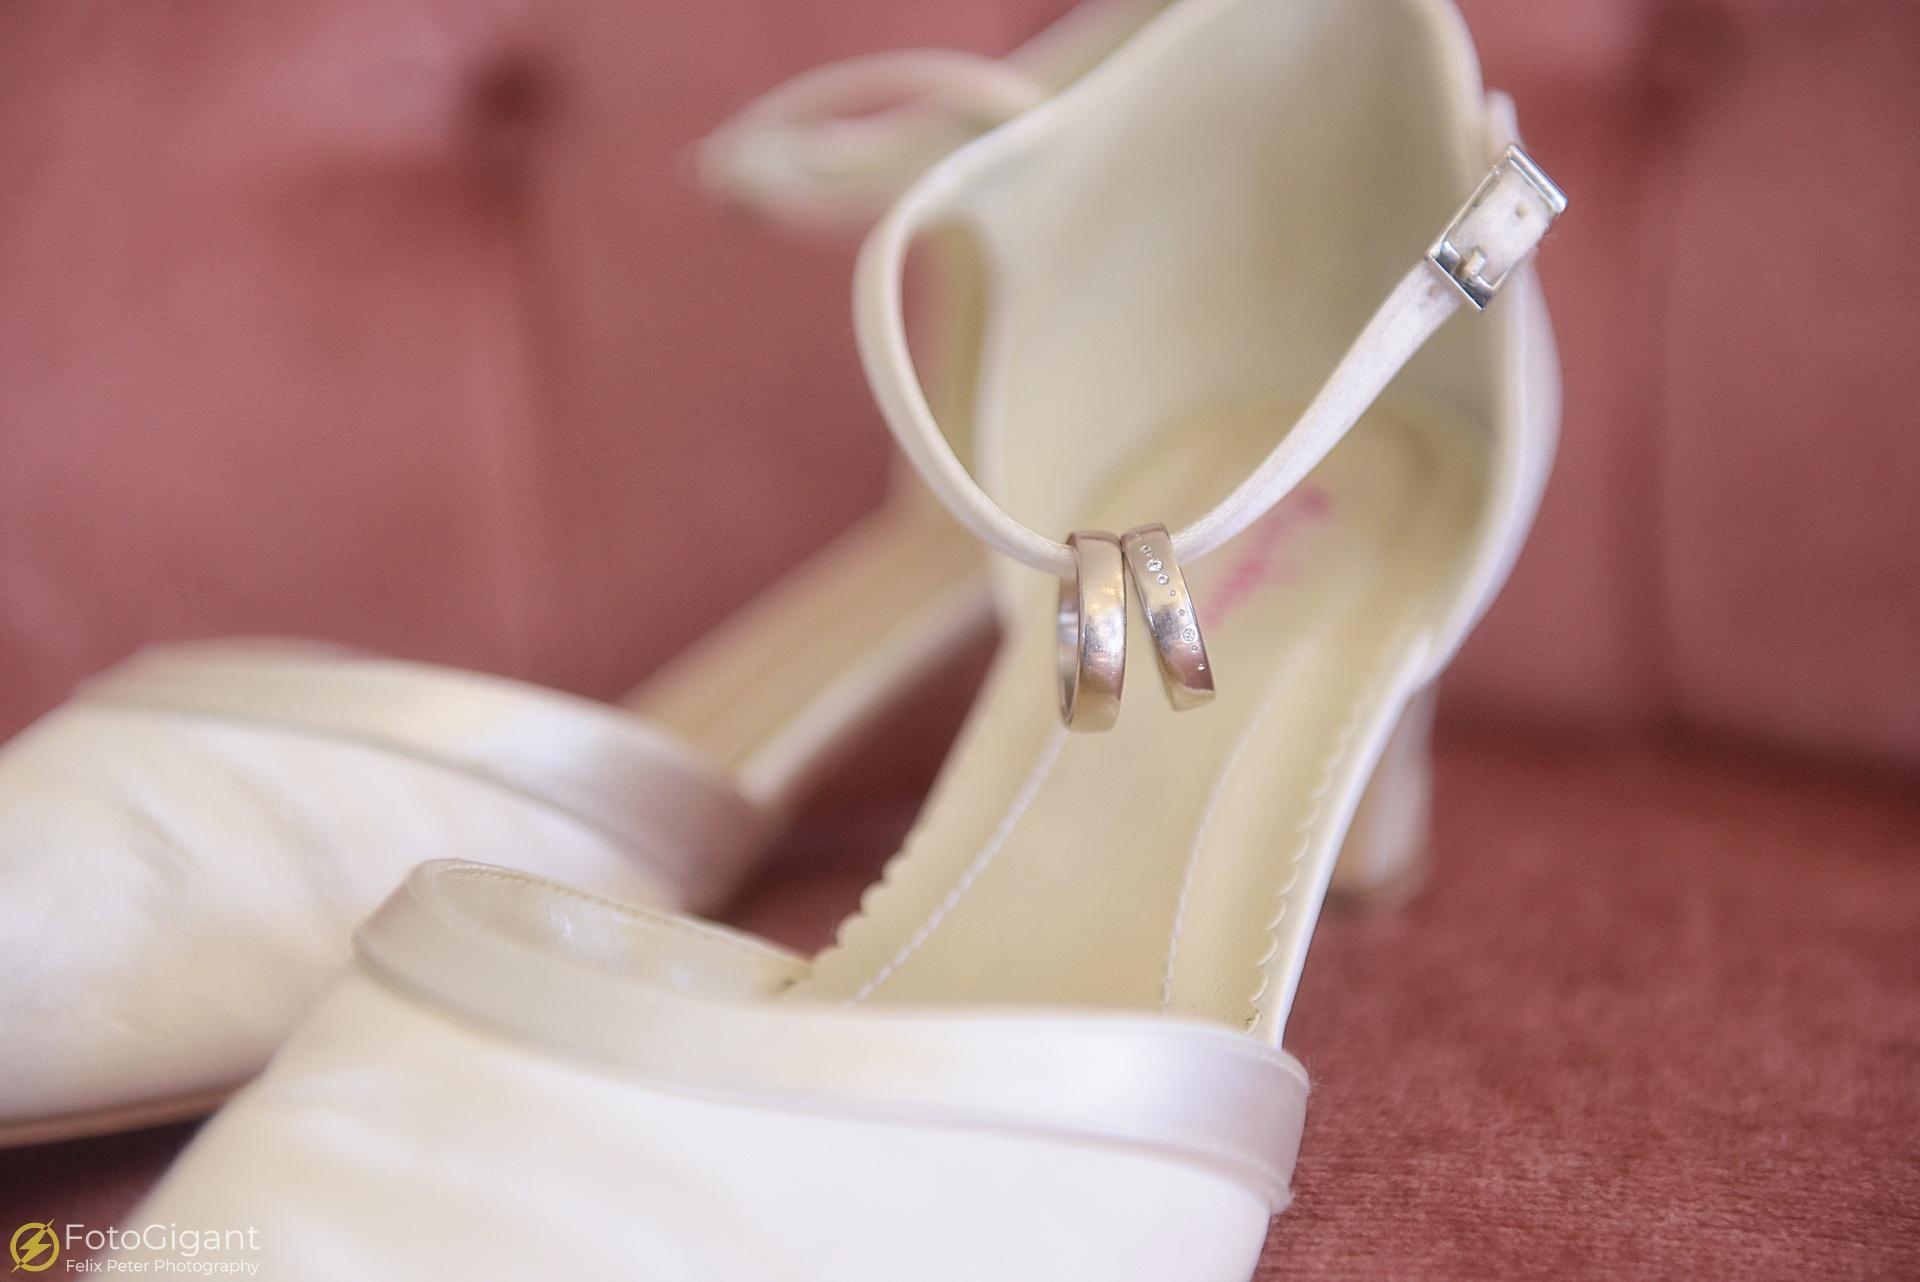 Hochzeitsfotografiekurs_Fotograf_Felix_Peter_05.jpg